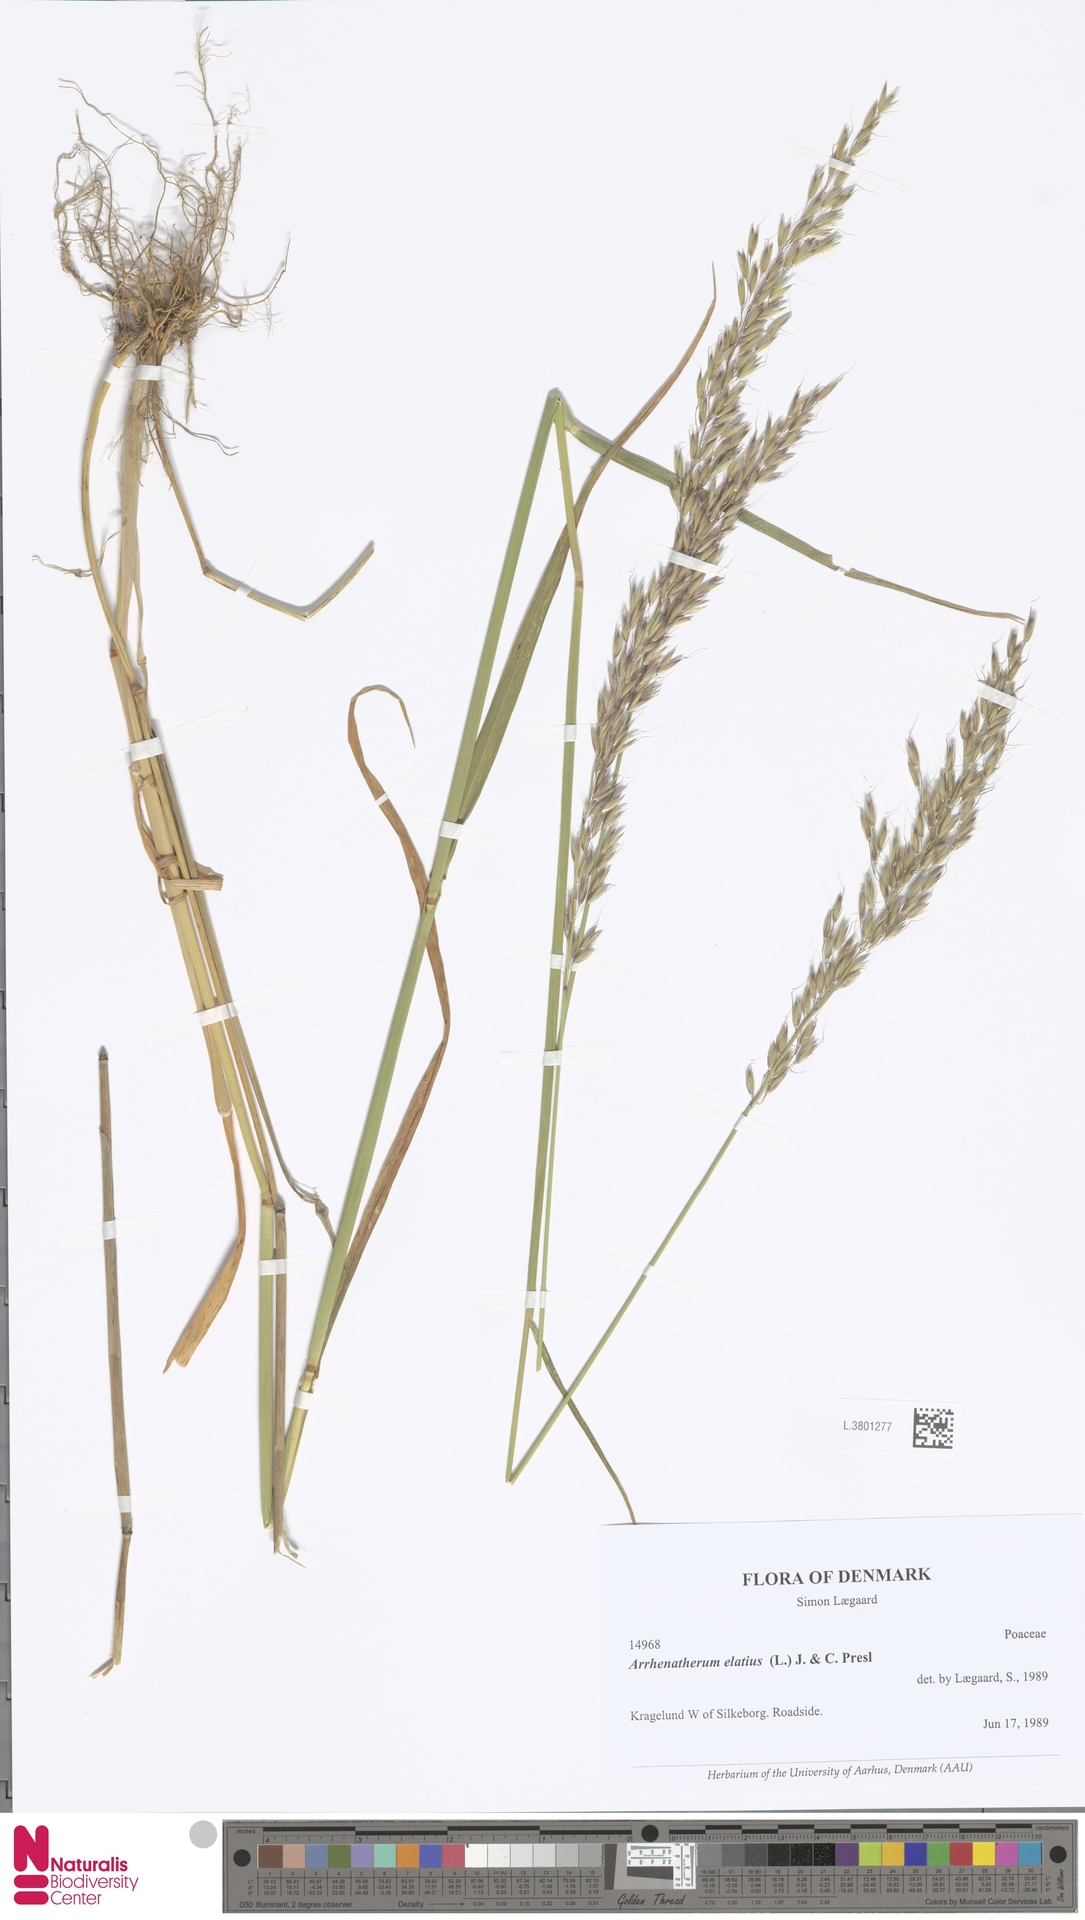 L.3801277 | Arrhenatherum elatius (L.) P.Beauv. ex J.Presl & C.Presl